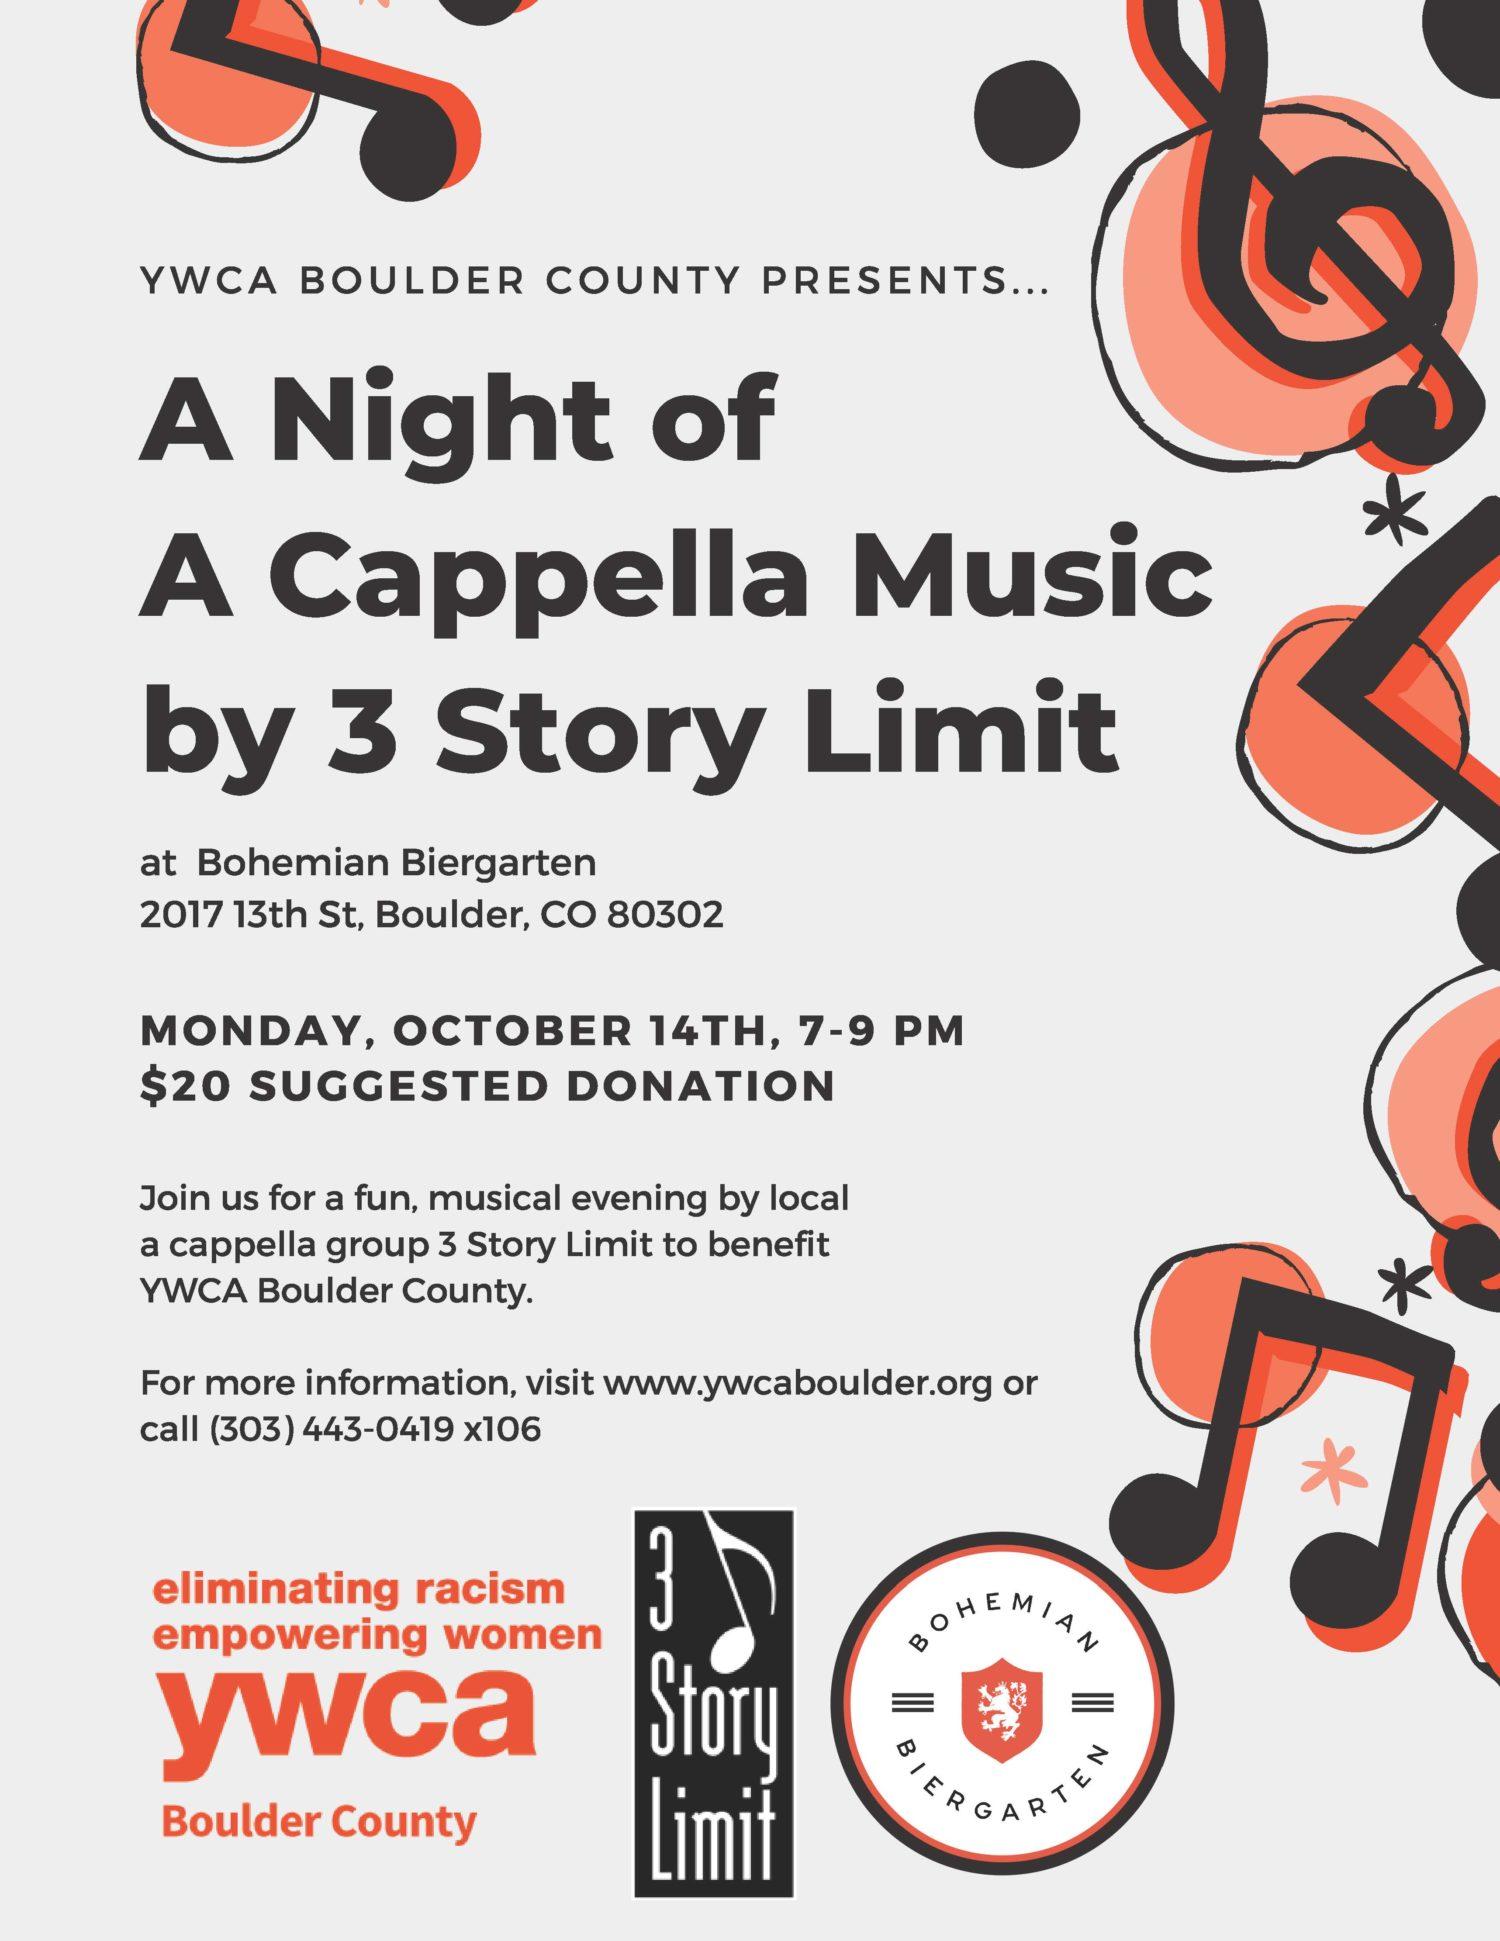 A Night of A Capella Music by 3 Story Limit @ Bohemian Biergarten